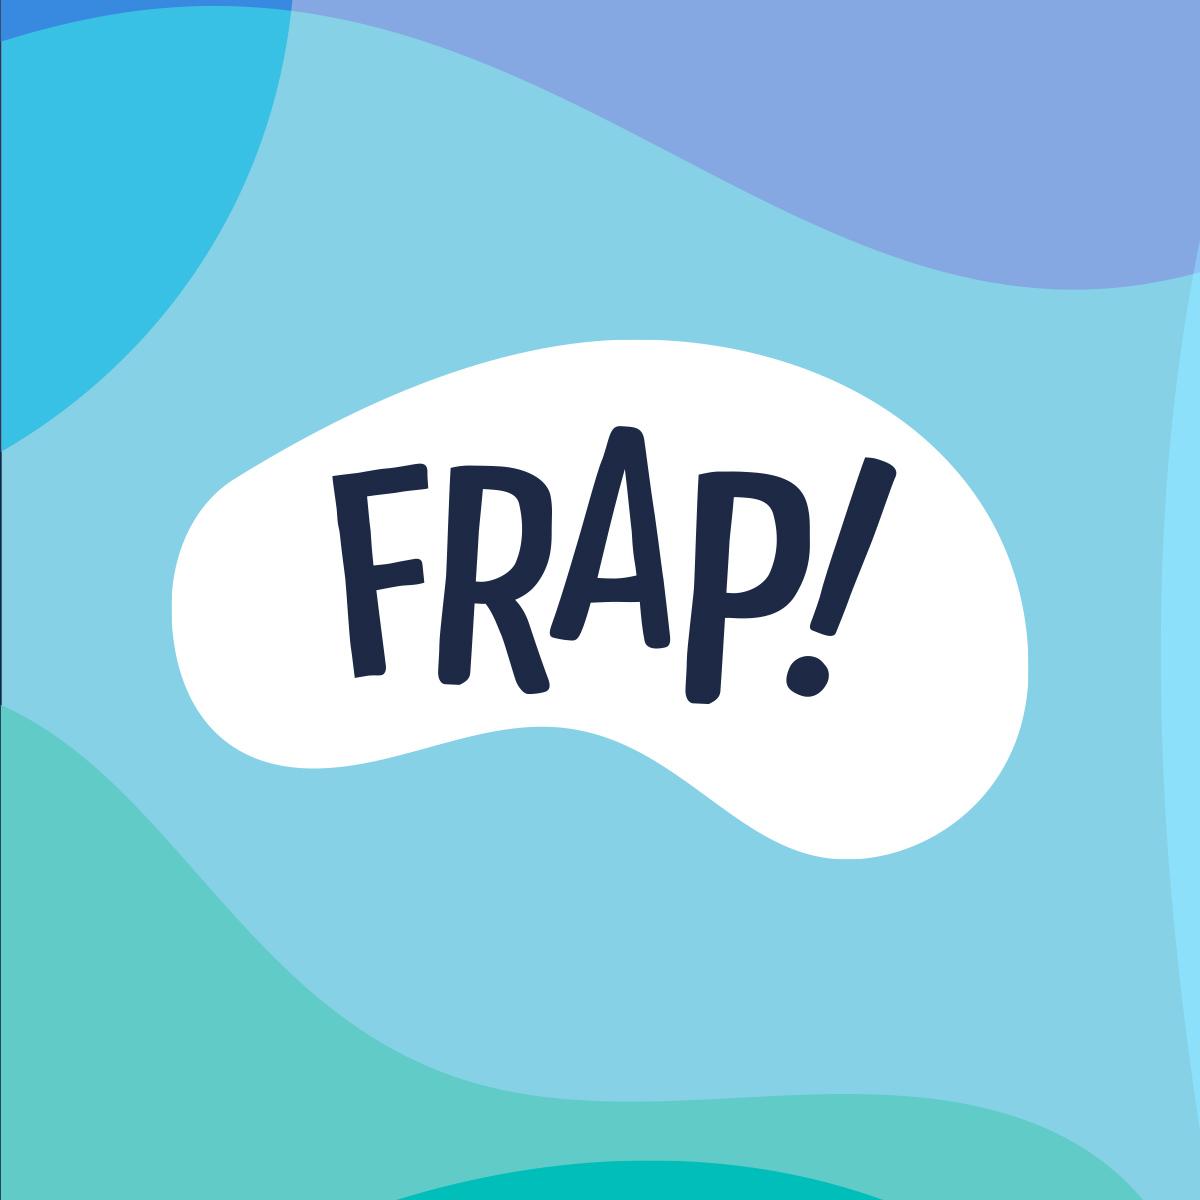 Various-Logos_Frap